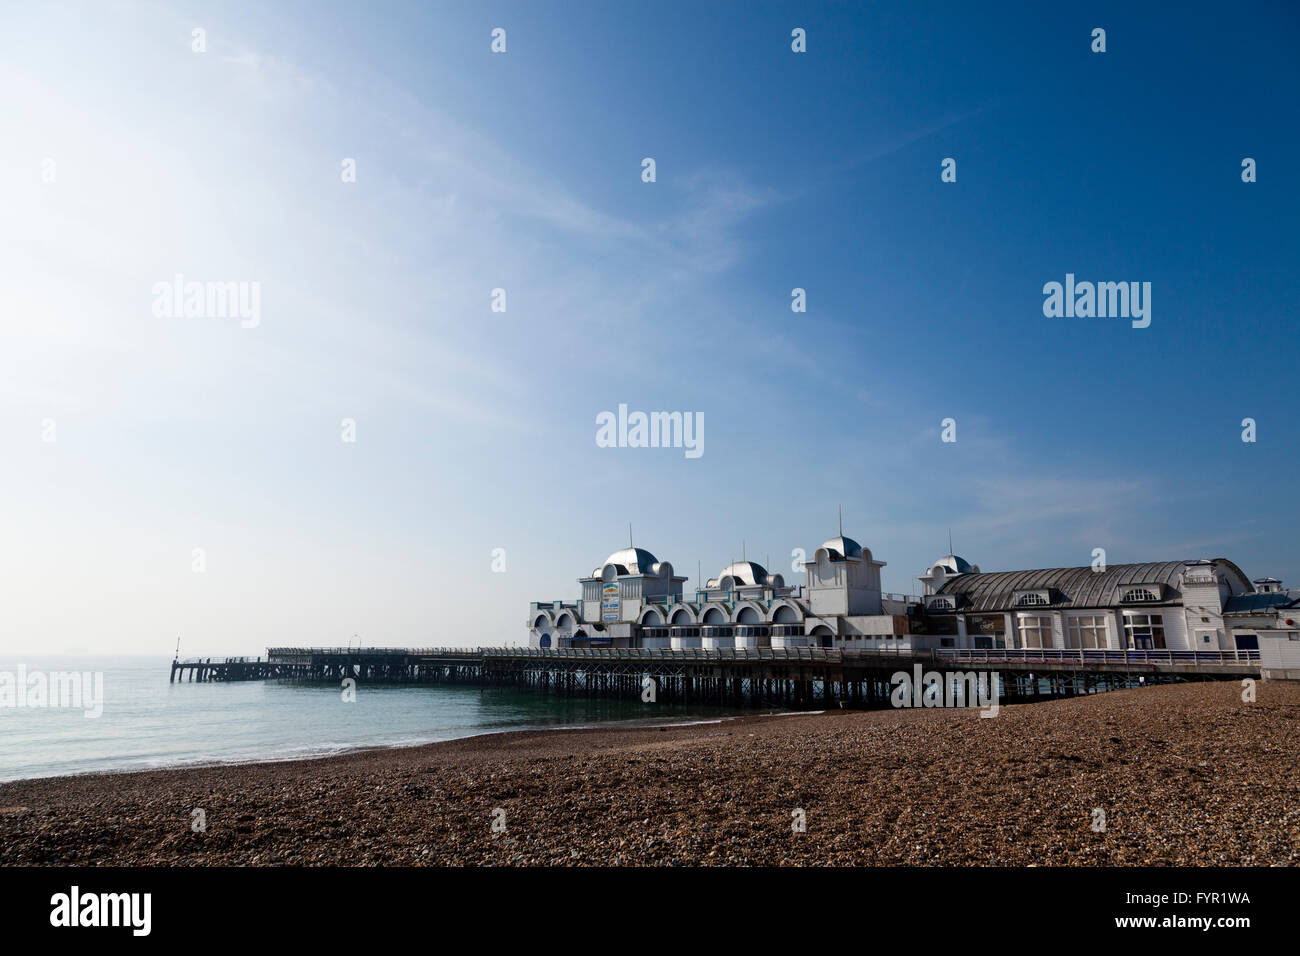 South Parade Pier, Southsea, Portsmouth, Hampshire, England, United Kingdom - Stock Image